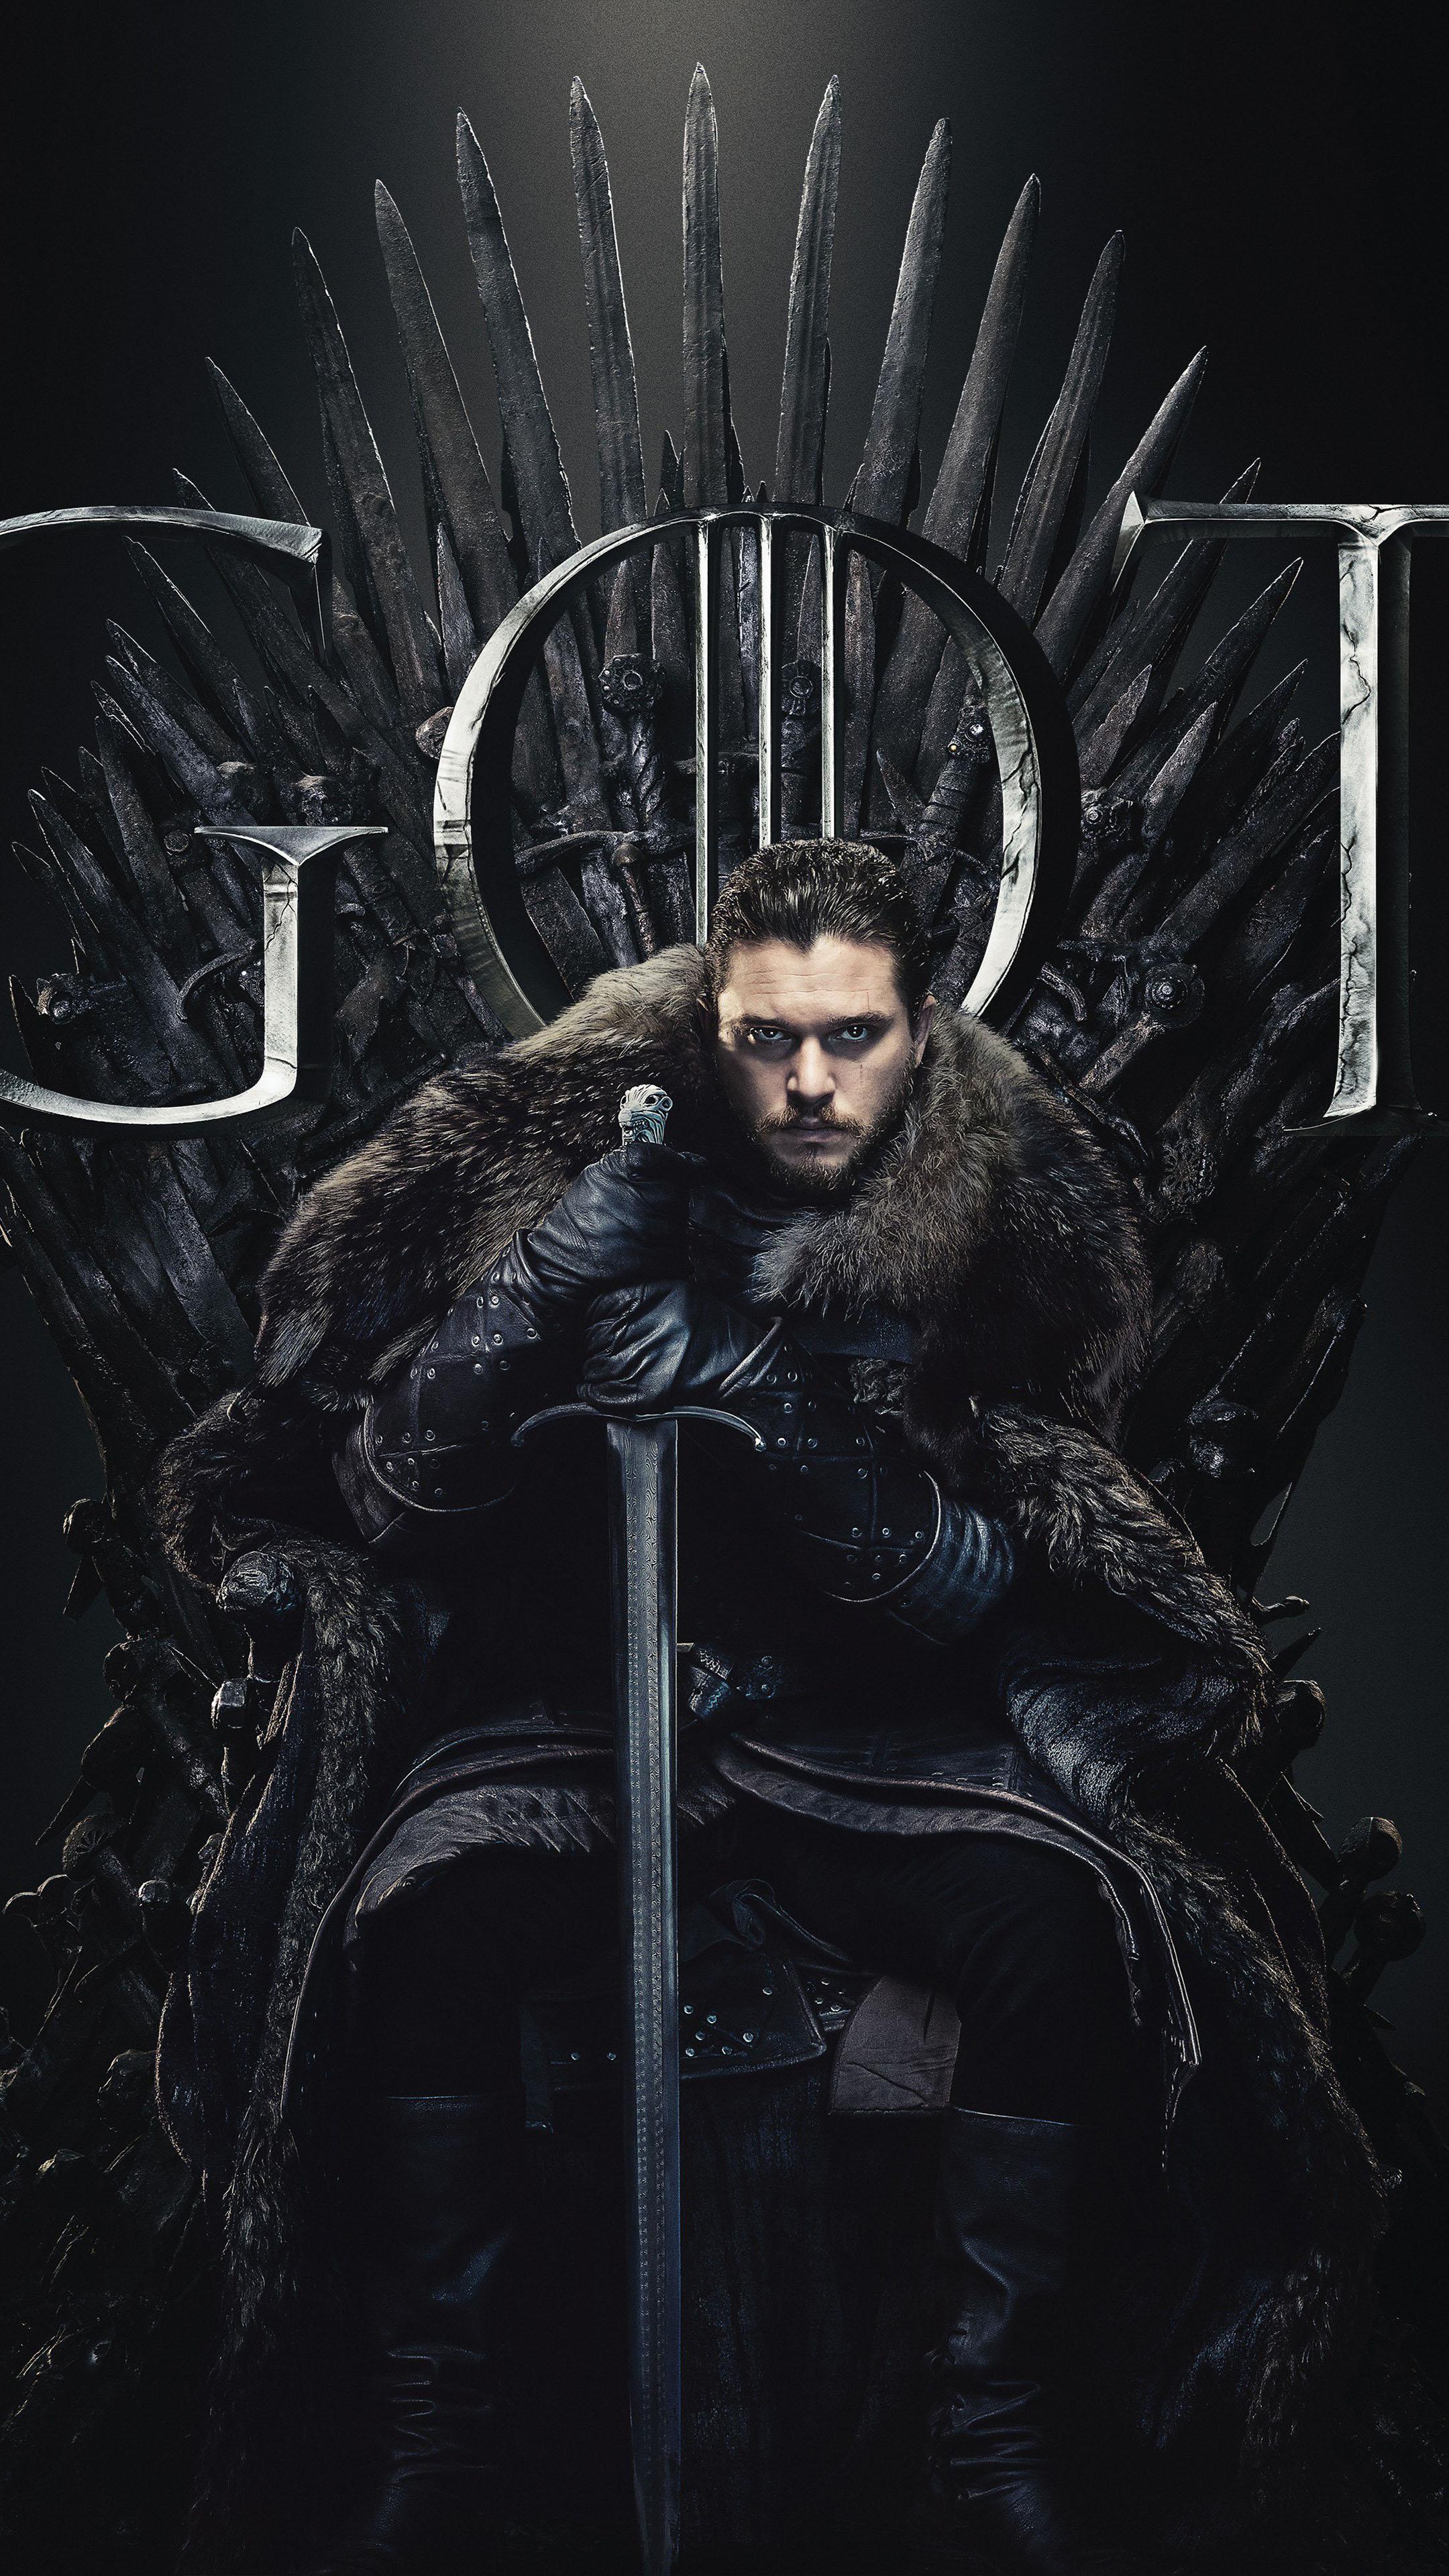 Download Best Quality Jon Snow In Game of Thrones Season 8 4K UHD 2160x3840